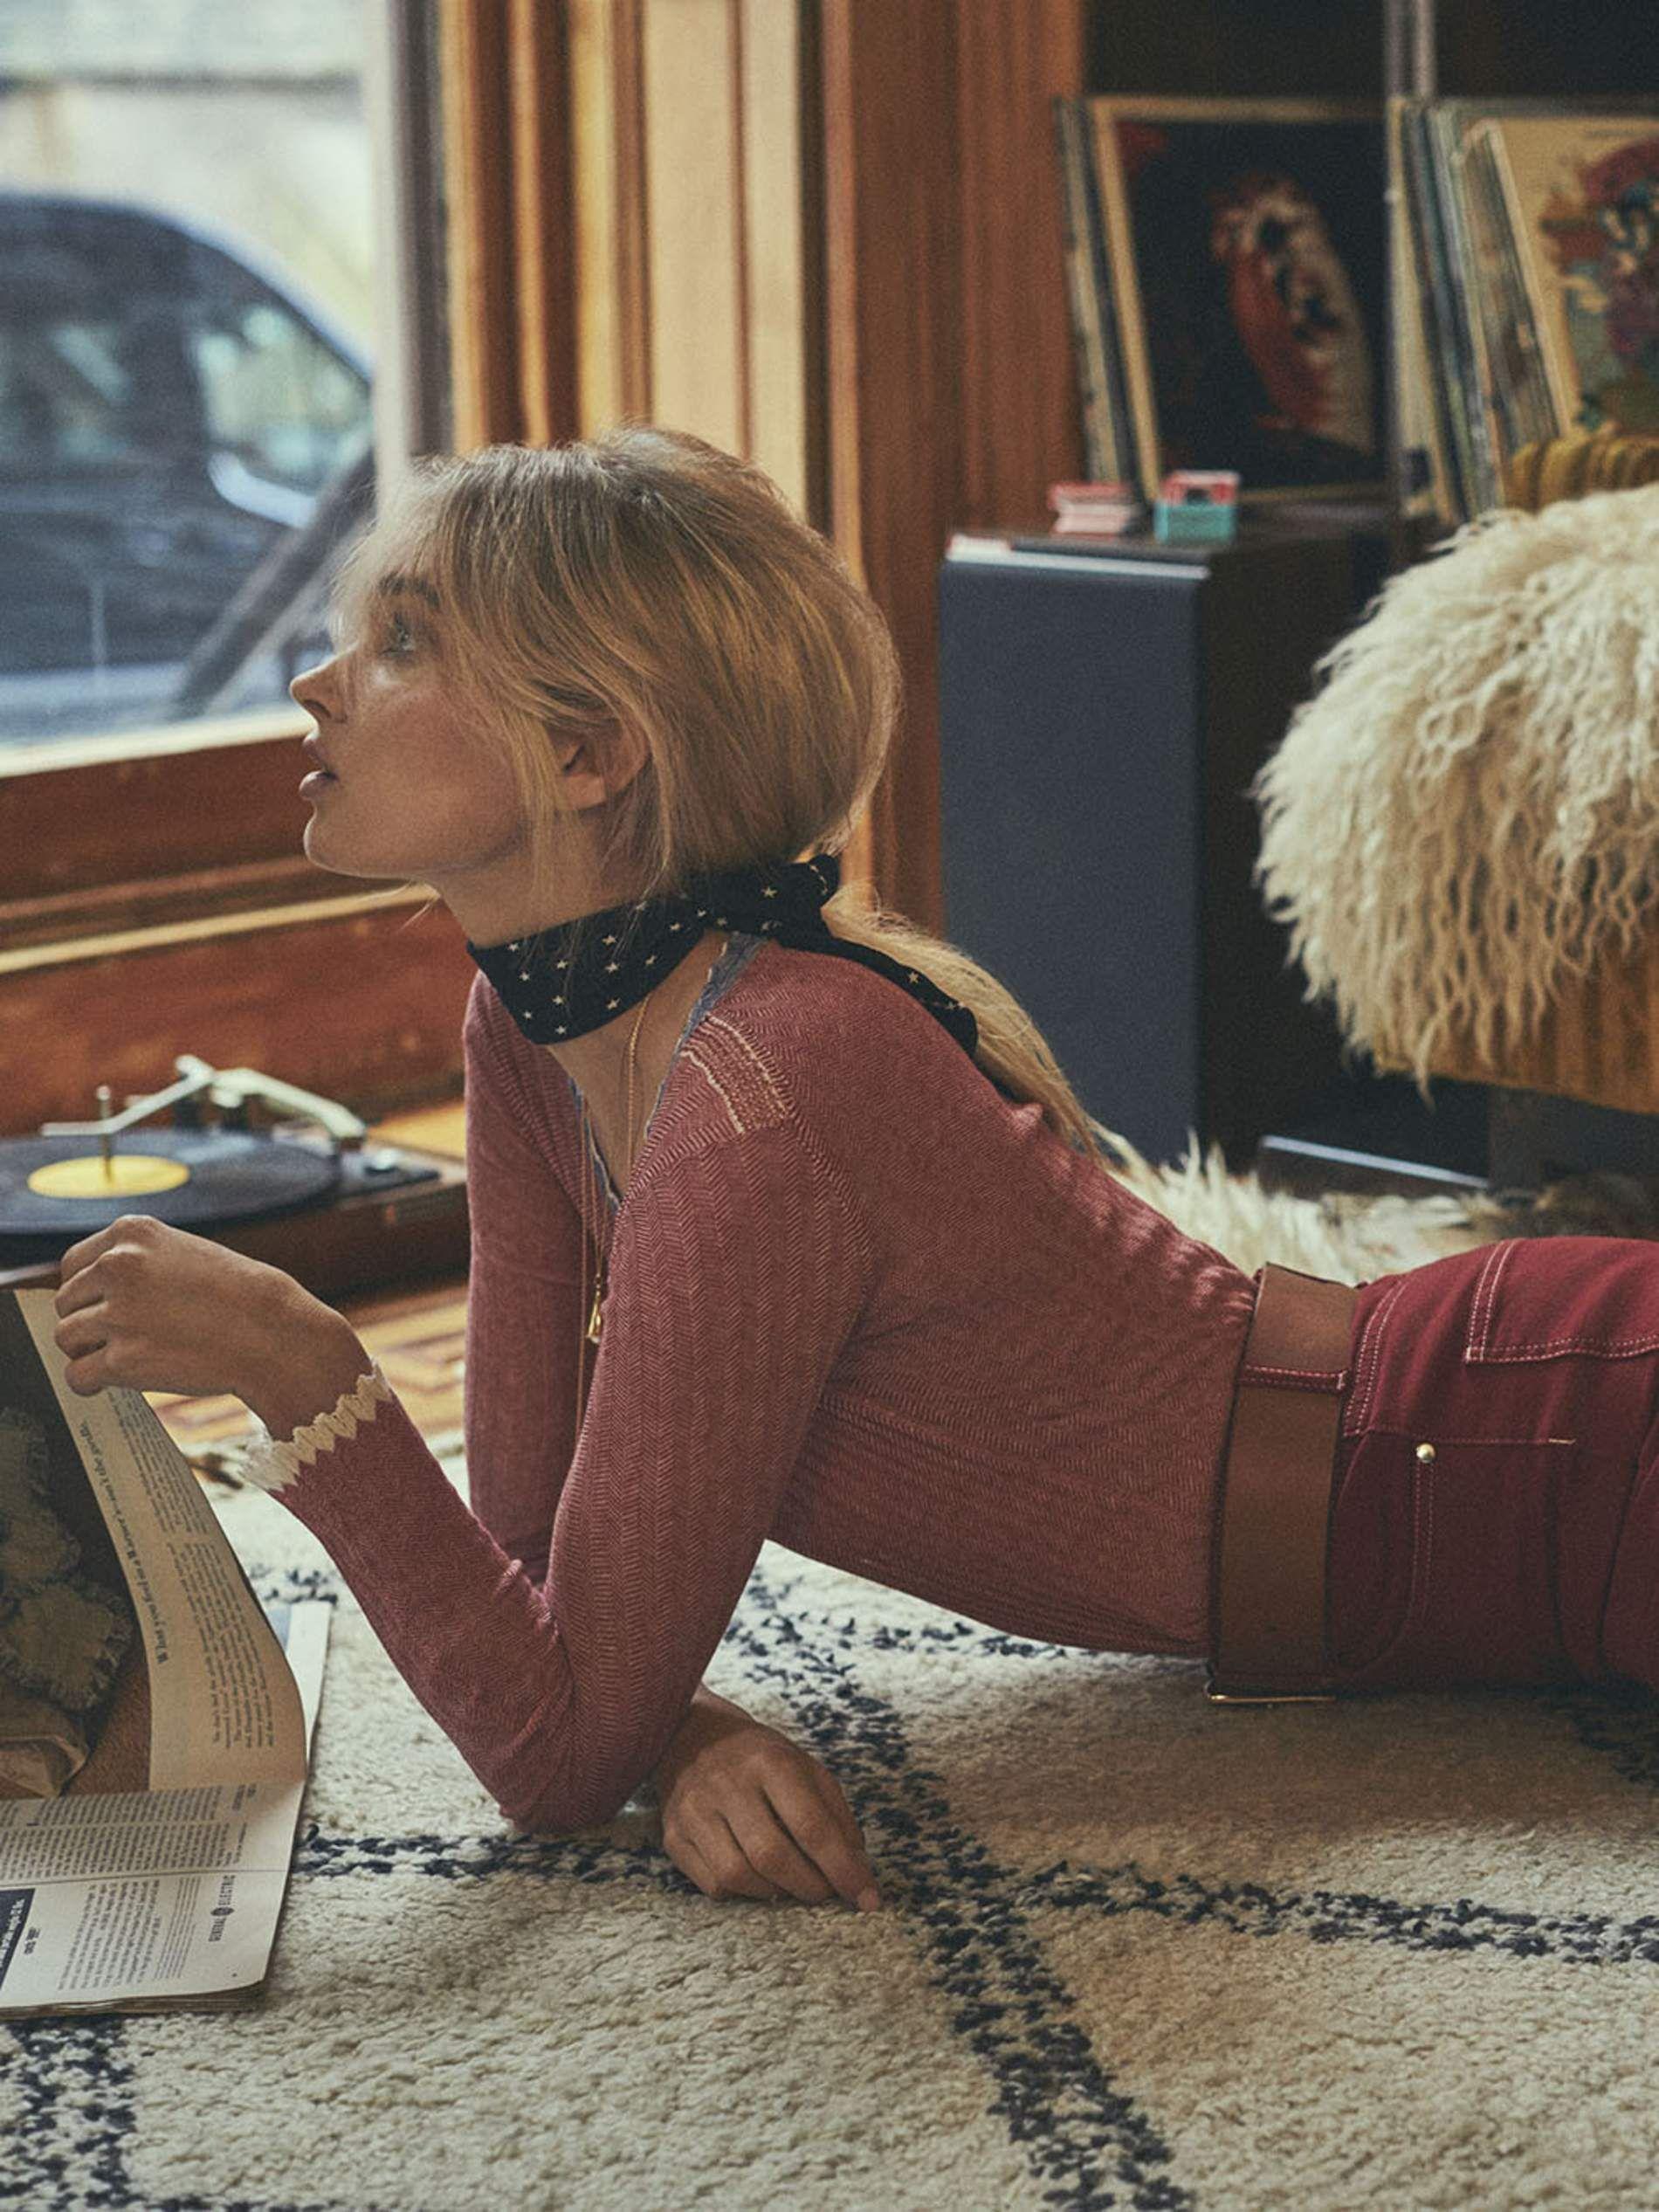 Model Elsa Hosk talks social media, body confidence & being 'anti-sexy'